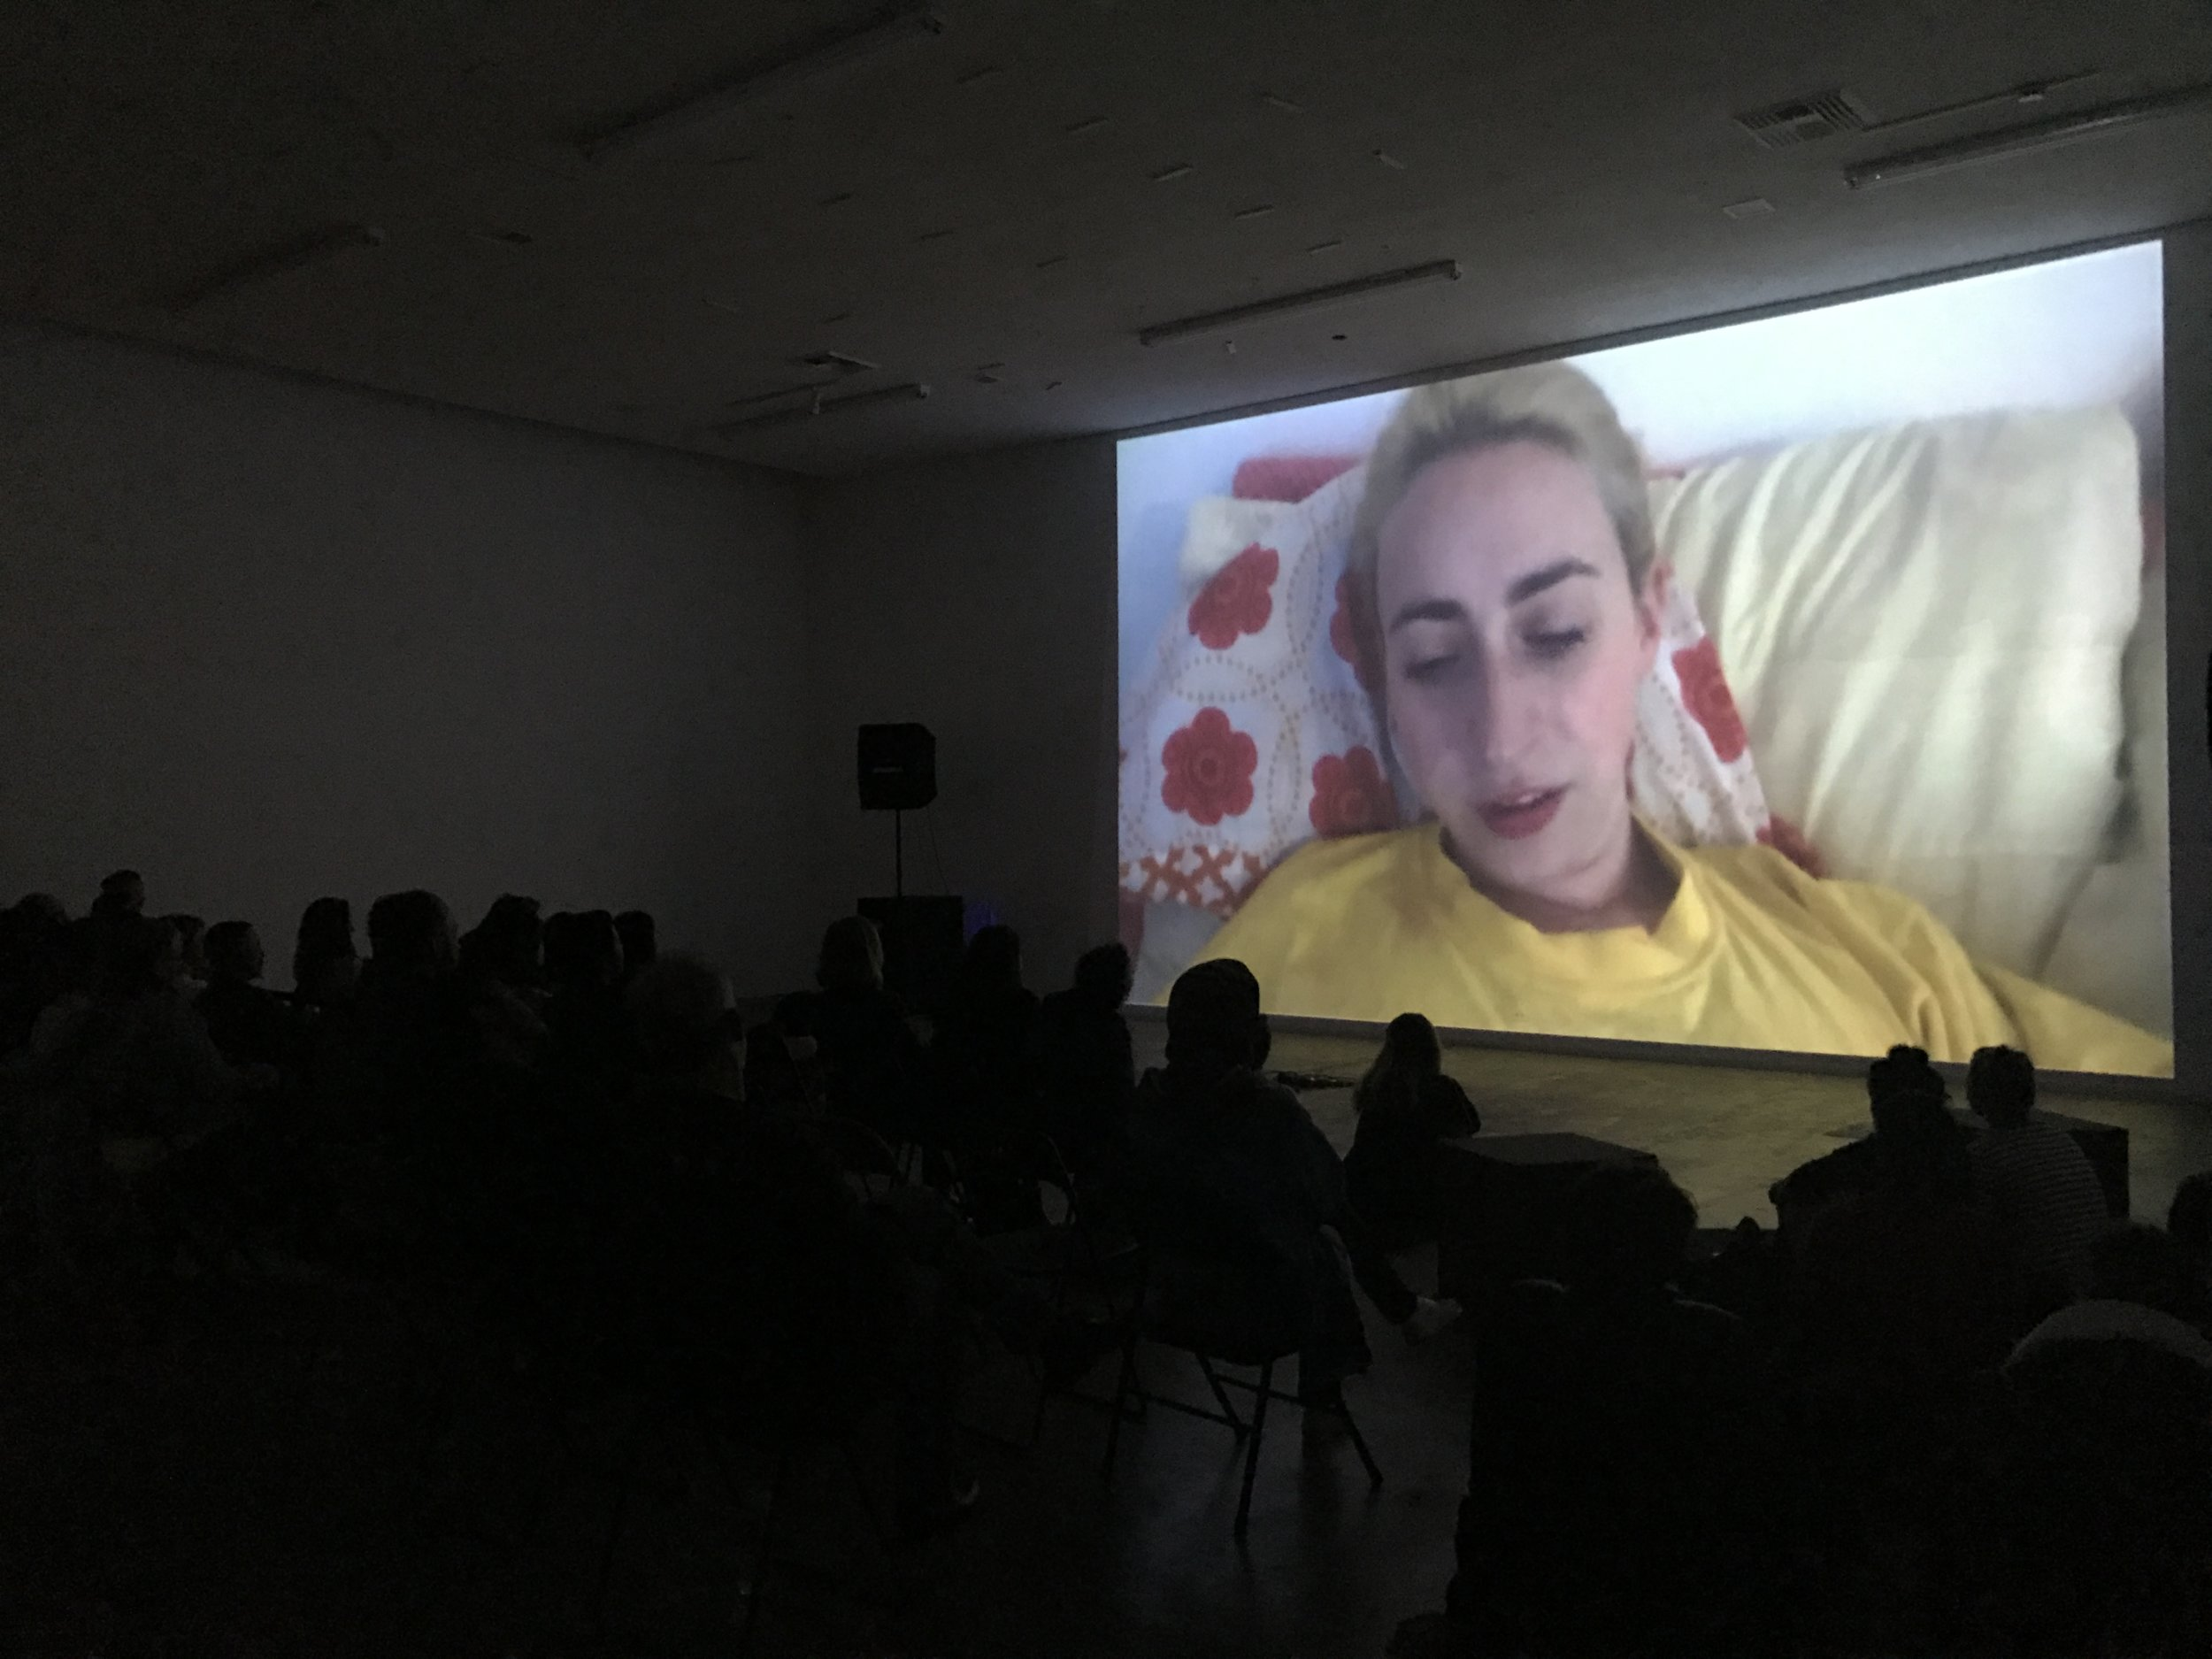 Screening: Heterotopias